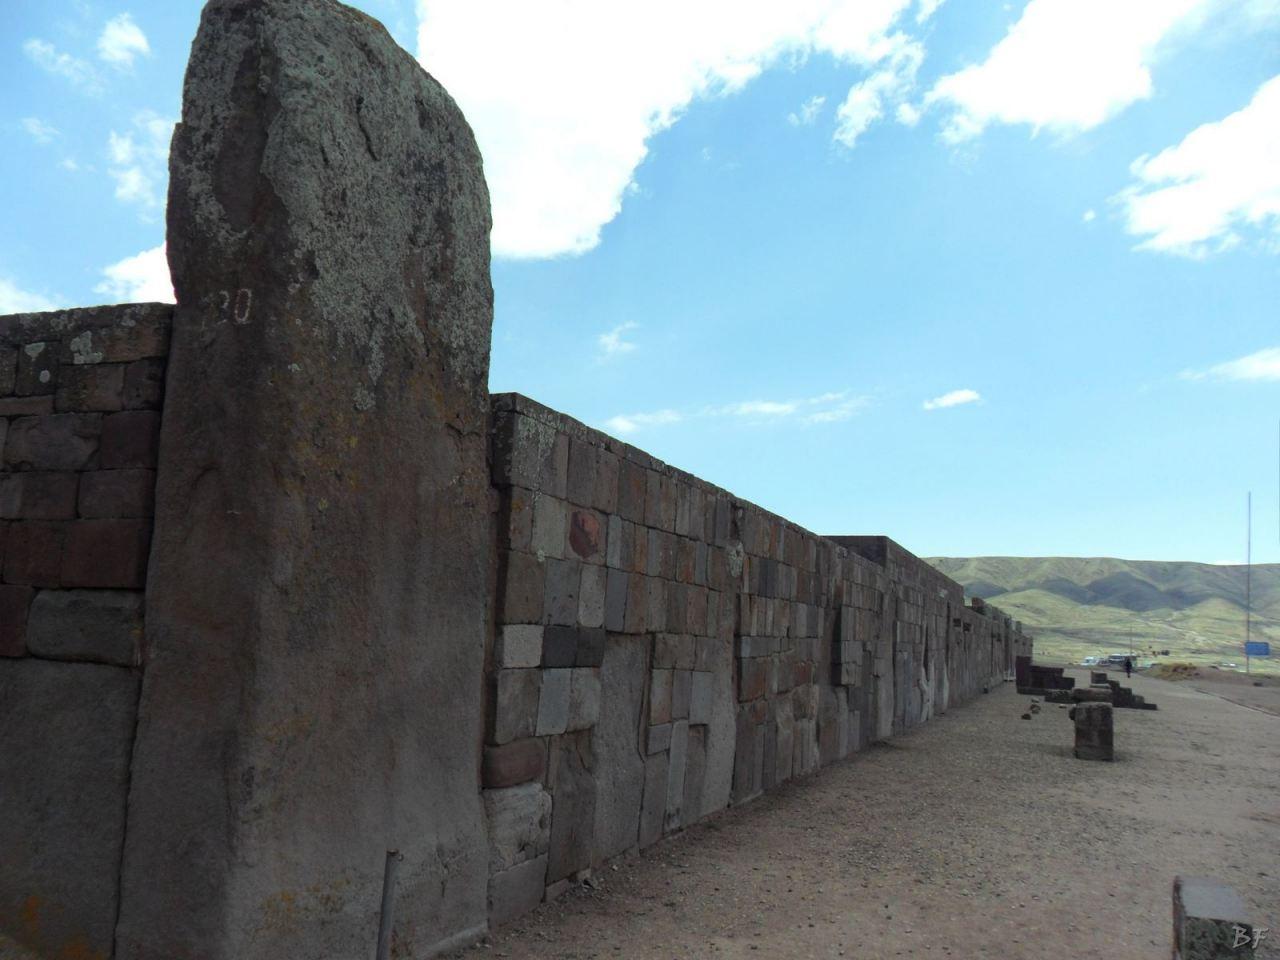 Sito-Megalitico-Piramide-Akapana-Kalasasaya-Menhir-Tiahuanaco-Bolivia-66